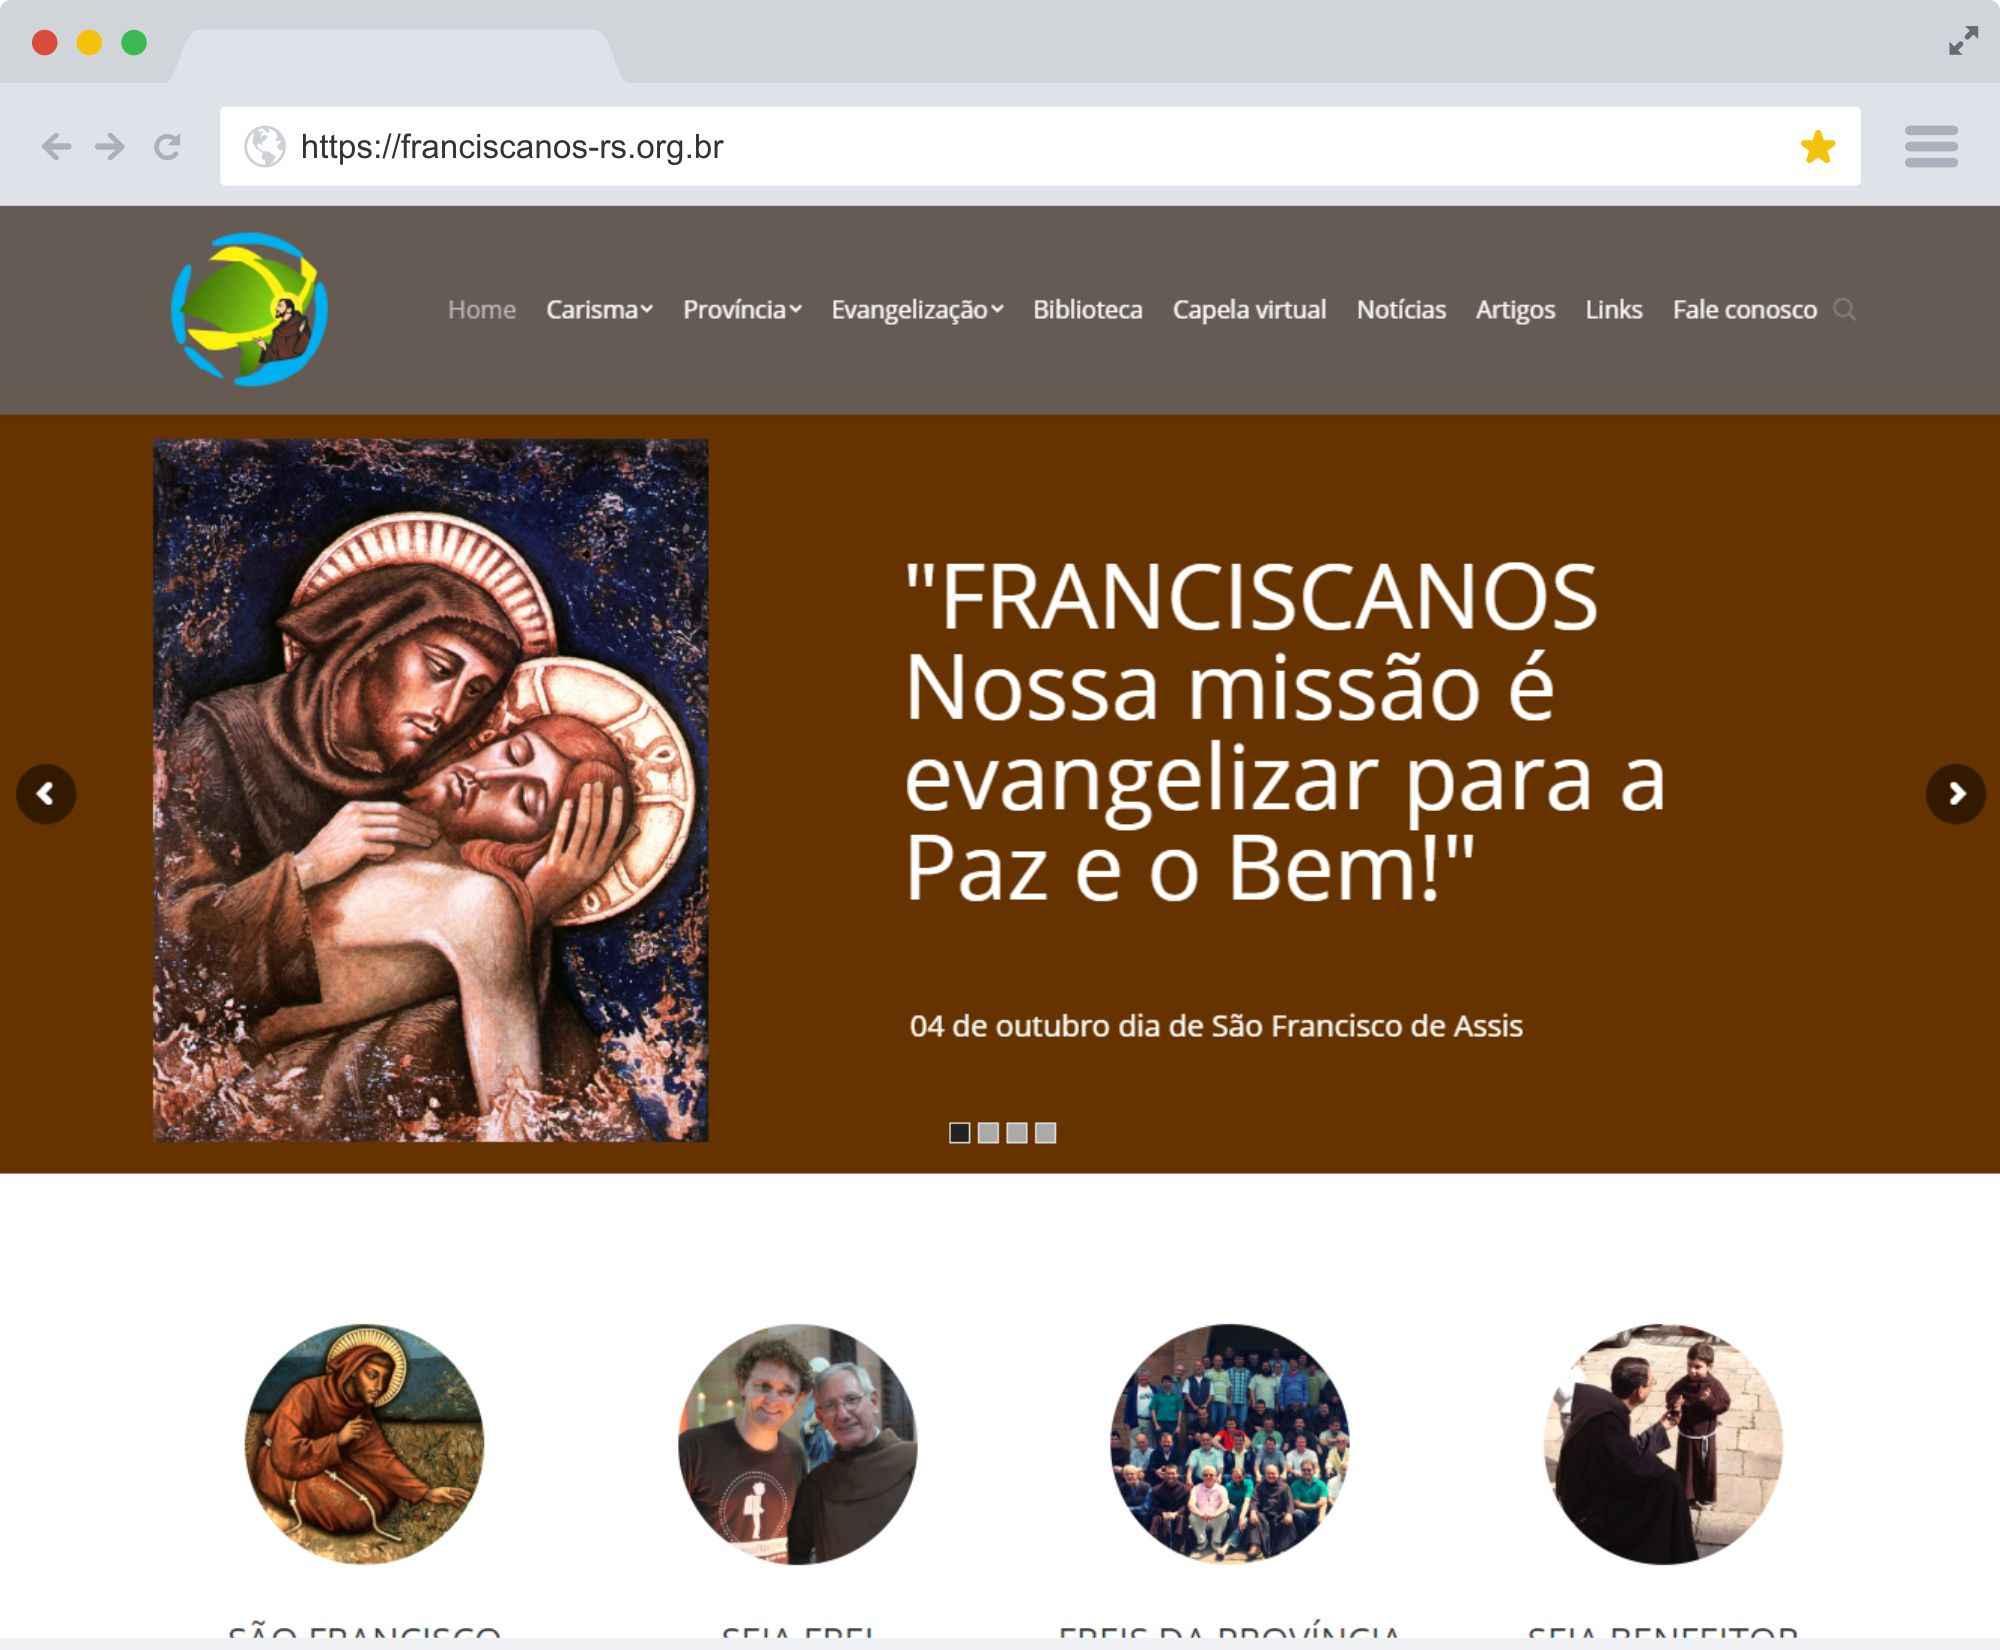 franciscanos-rs.org.br